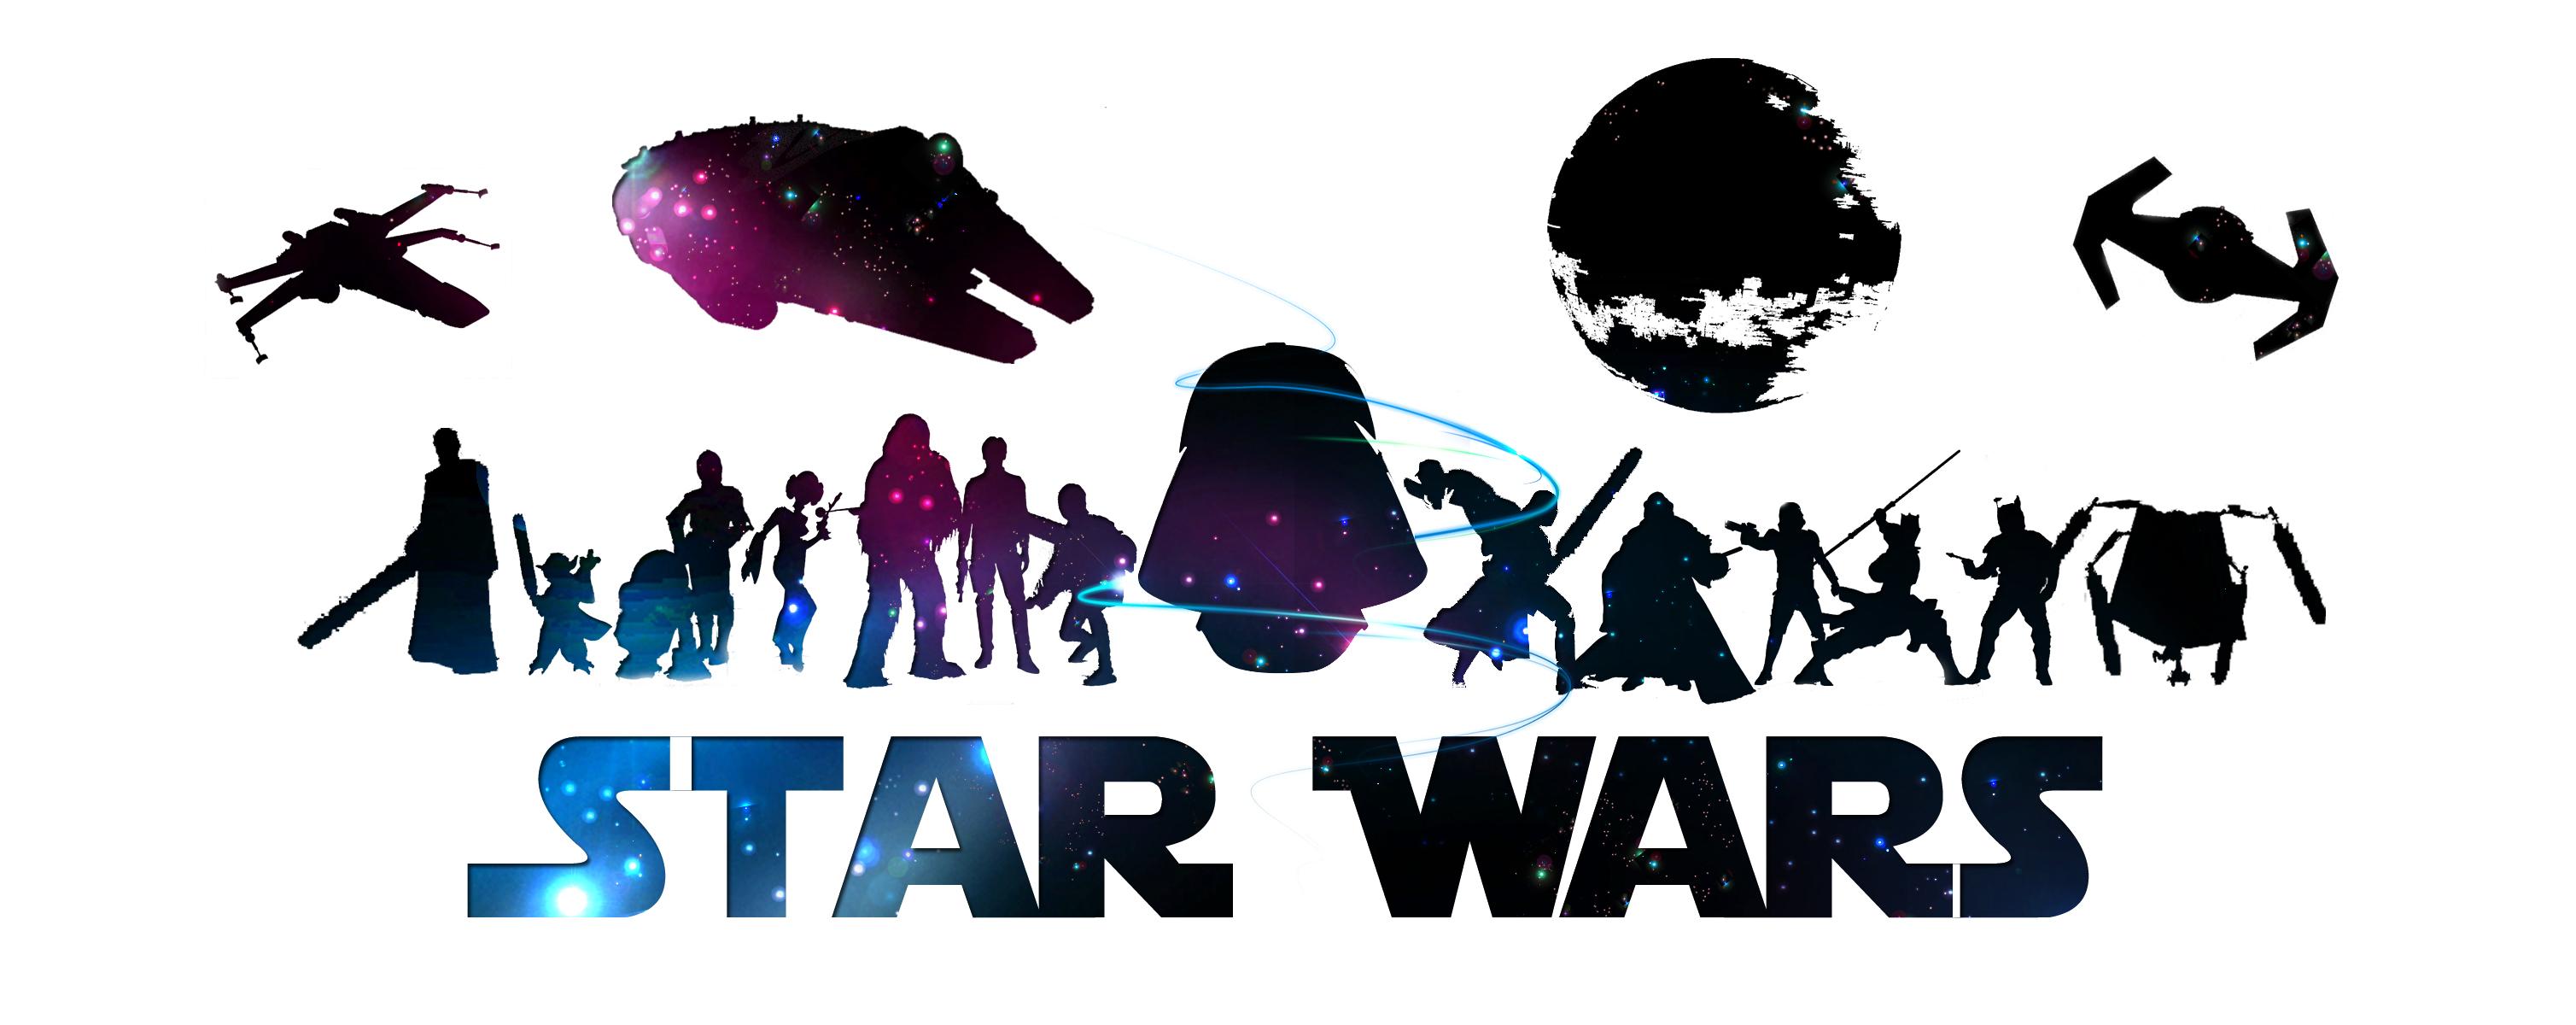 star wars silhouette vector at getdrawings com free for personal rh getdrawings com star wars logo vectorizado star wars logo vector graphic